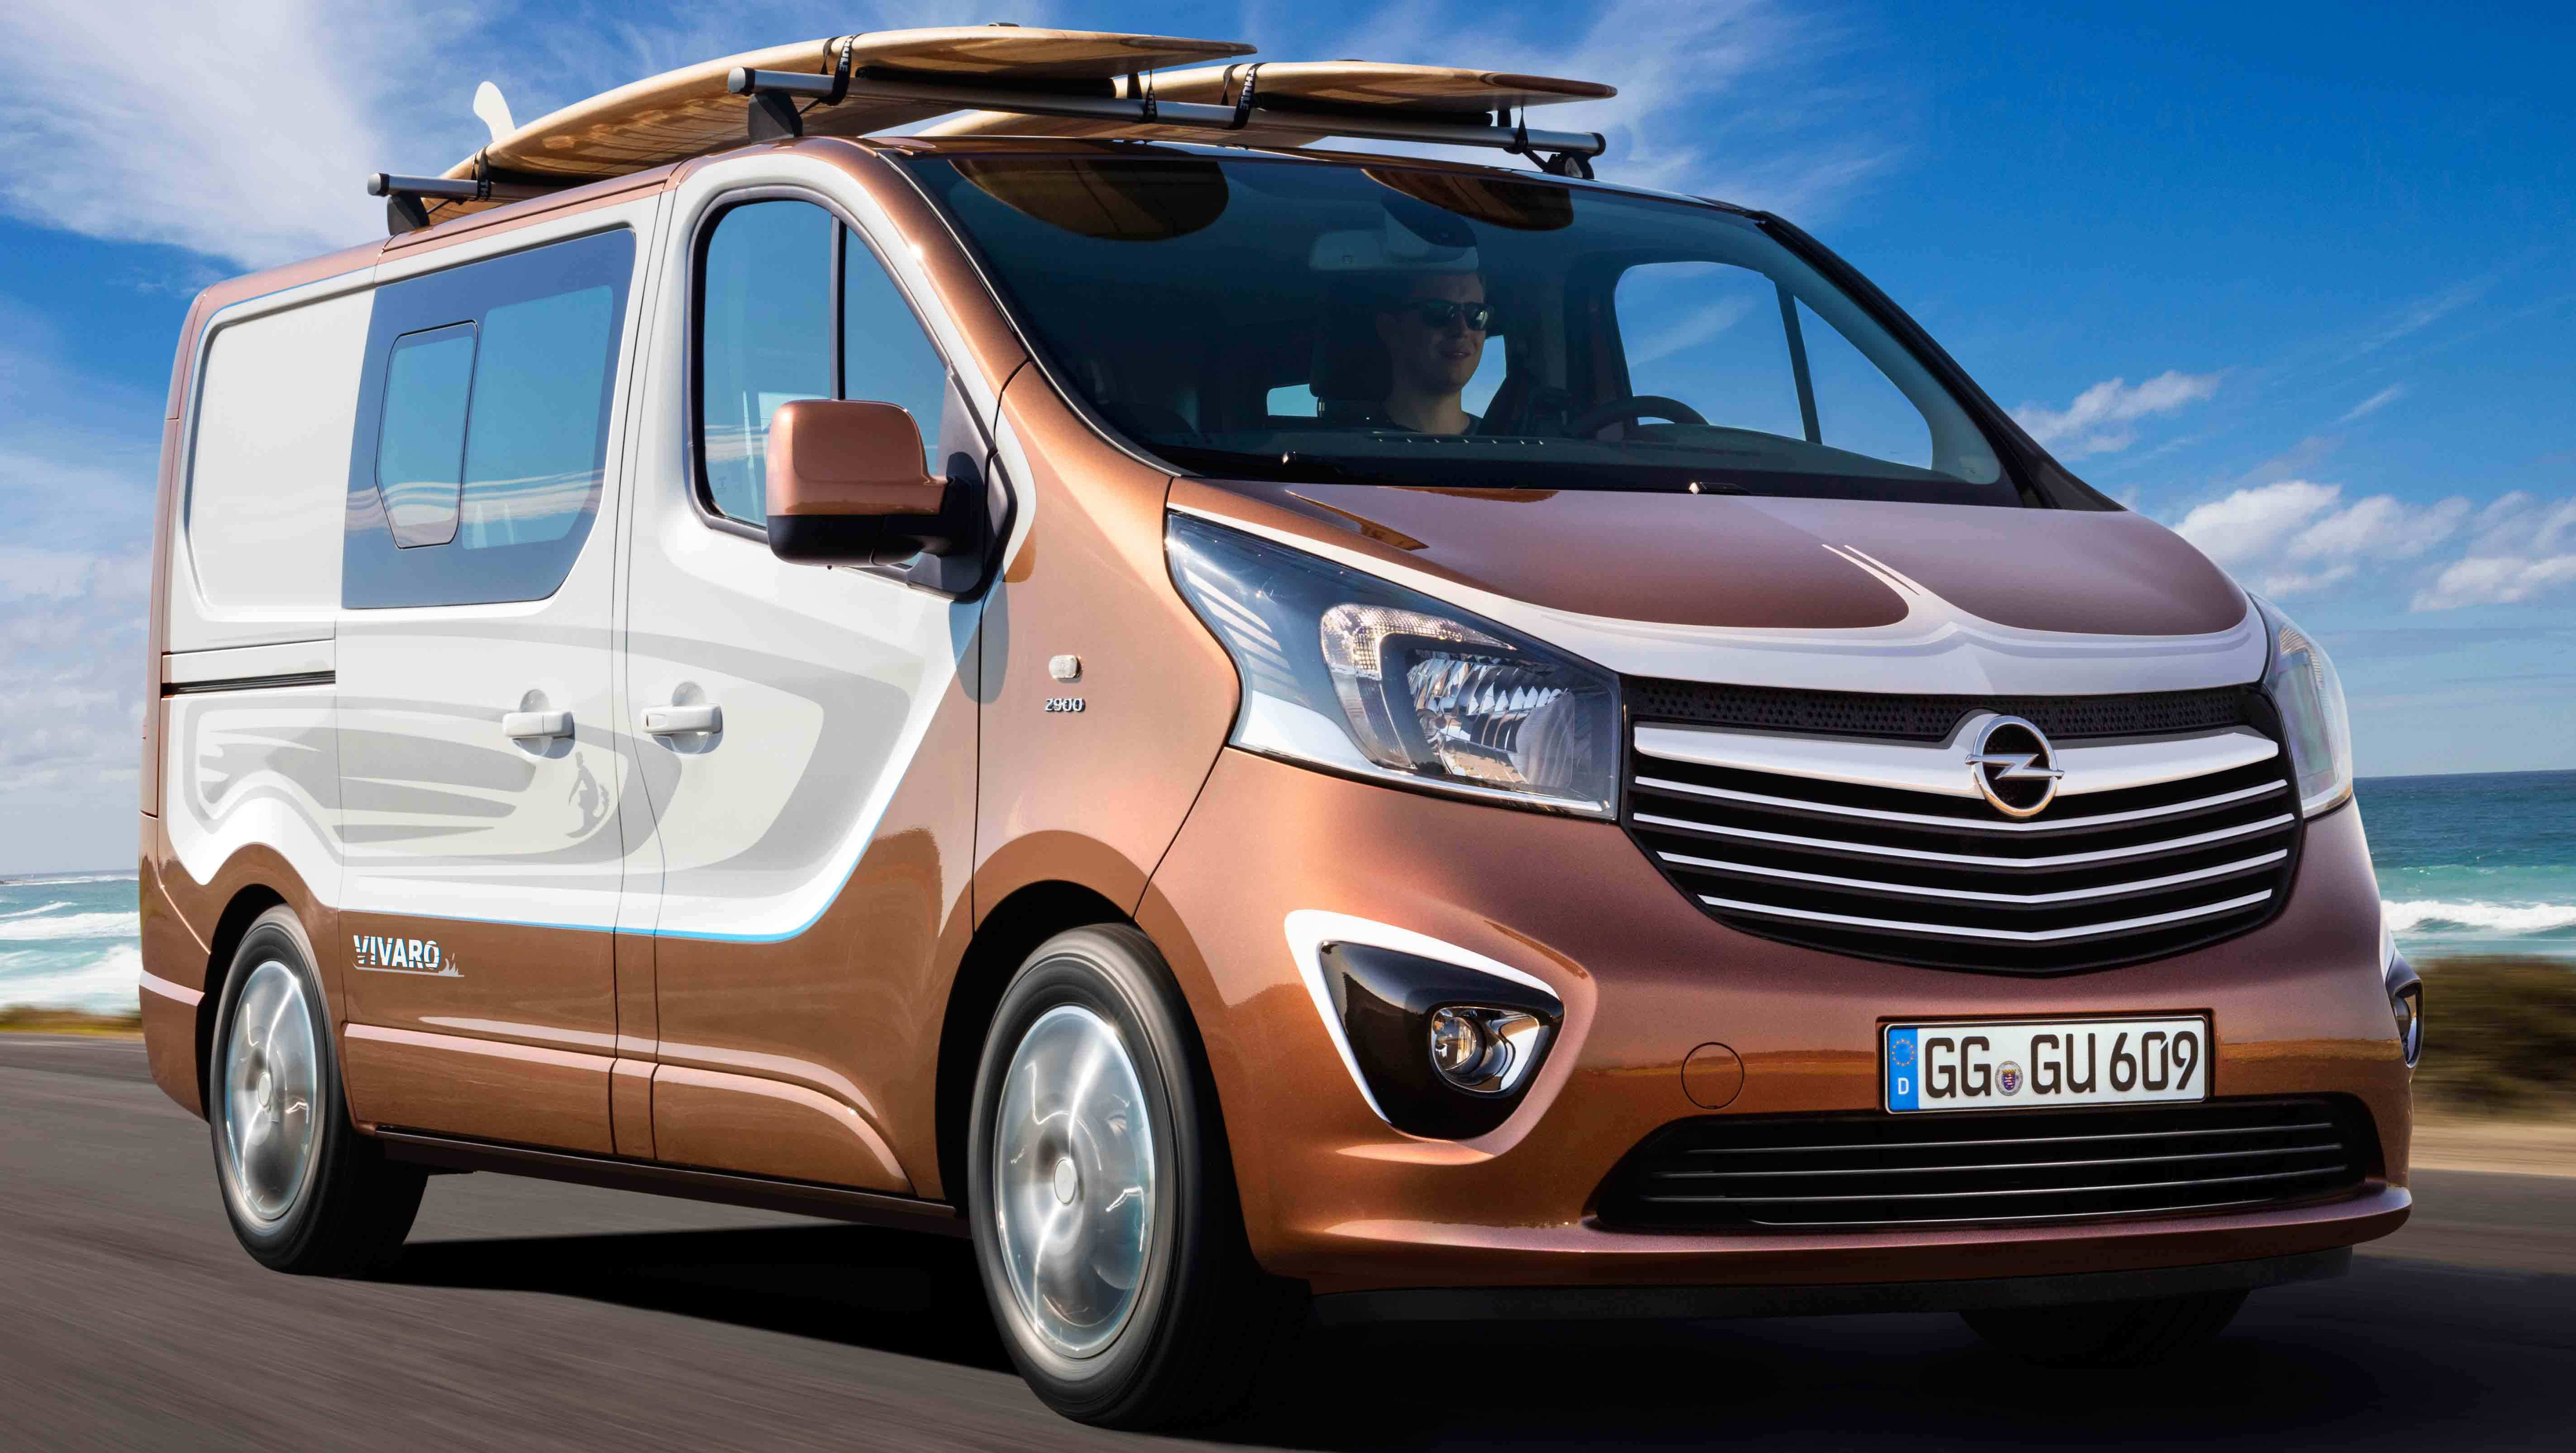 77 The 2020 Opel Vivaro 2018 Redesign by 2020 Opel Vivaro 2018